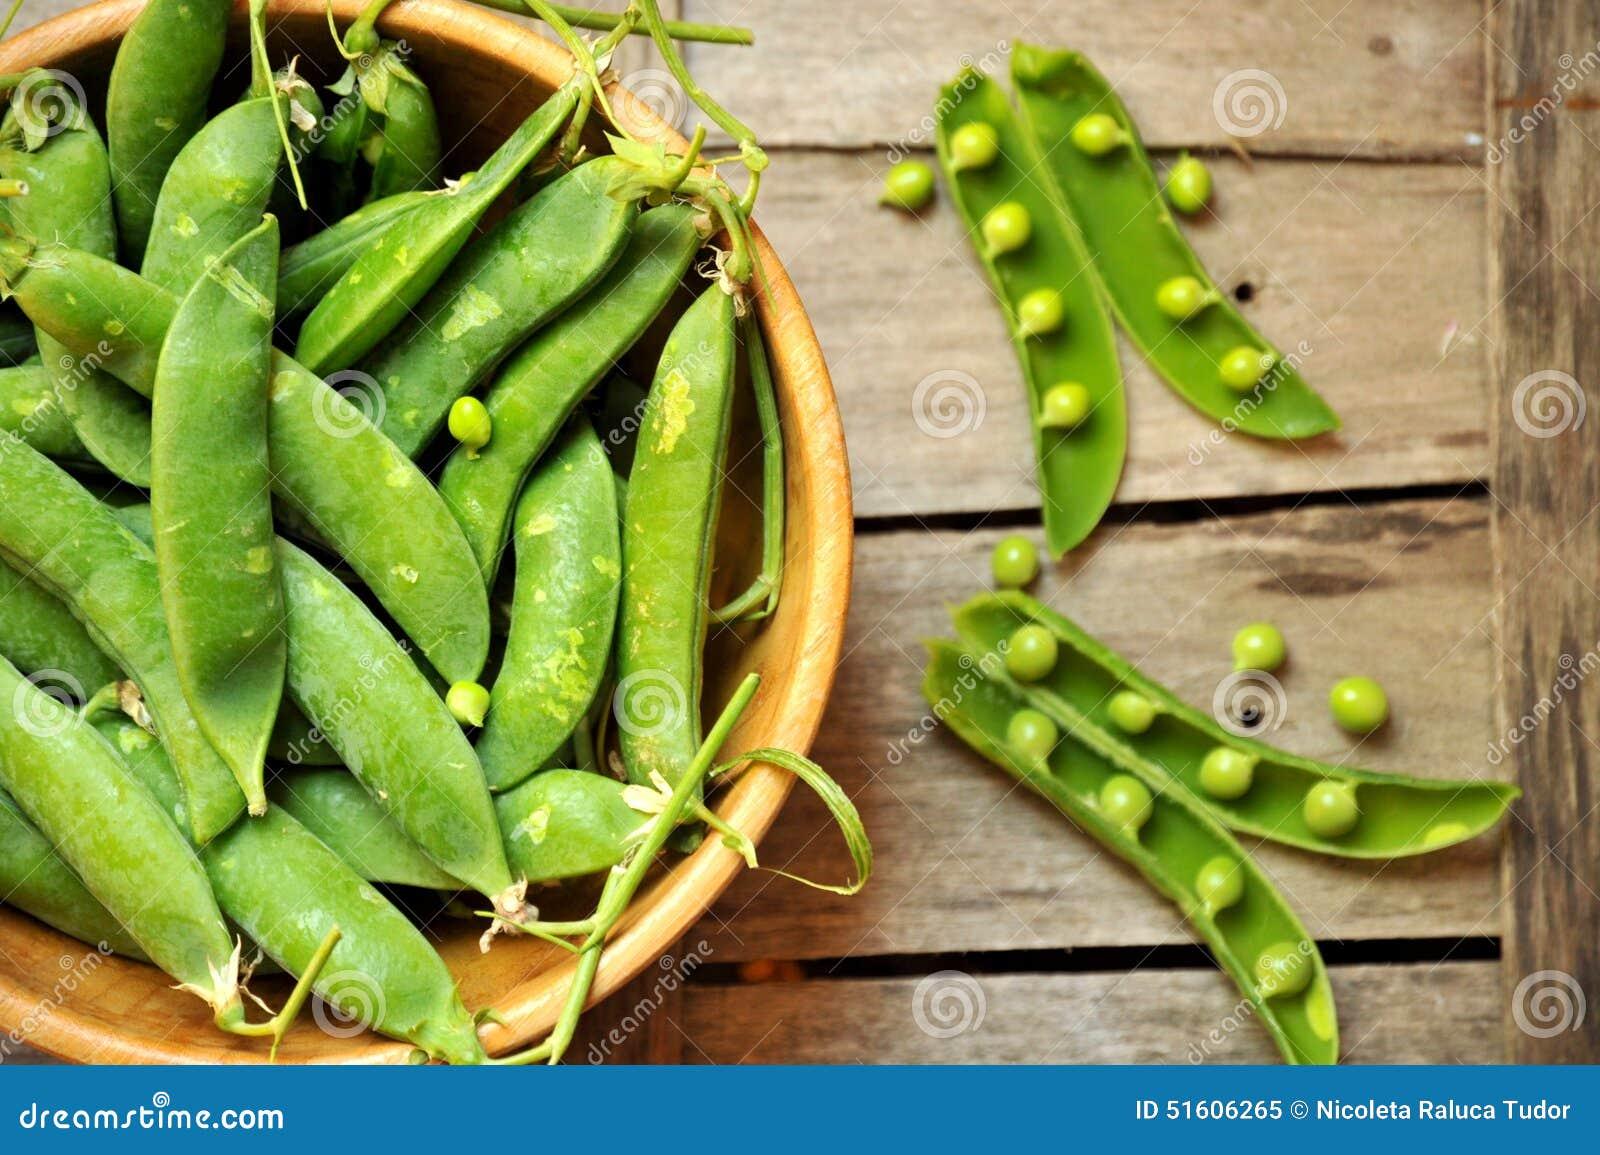 Green Leaf Detox Tea Fast Track Detox Diet Pdf Body Detox And Weight Loss Center Spokane Green Leaf Detox Tea Detox Or Cleanse.